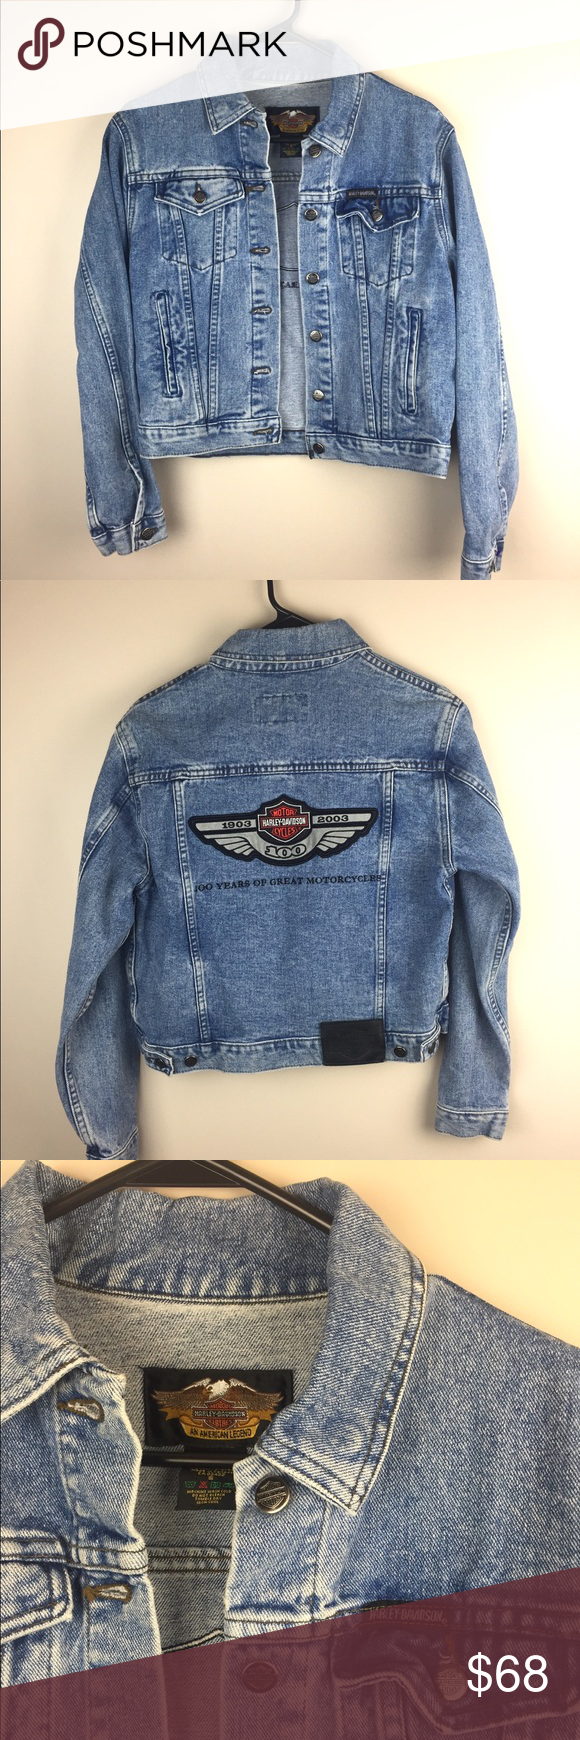 Harley Davidson 100 Year Anniversary Denim Jacket Denim Jacket Denim Jacket Women Jackets [ 1740 x 580 Pixel ]